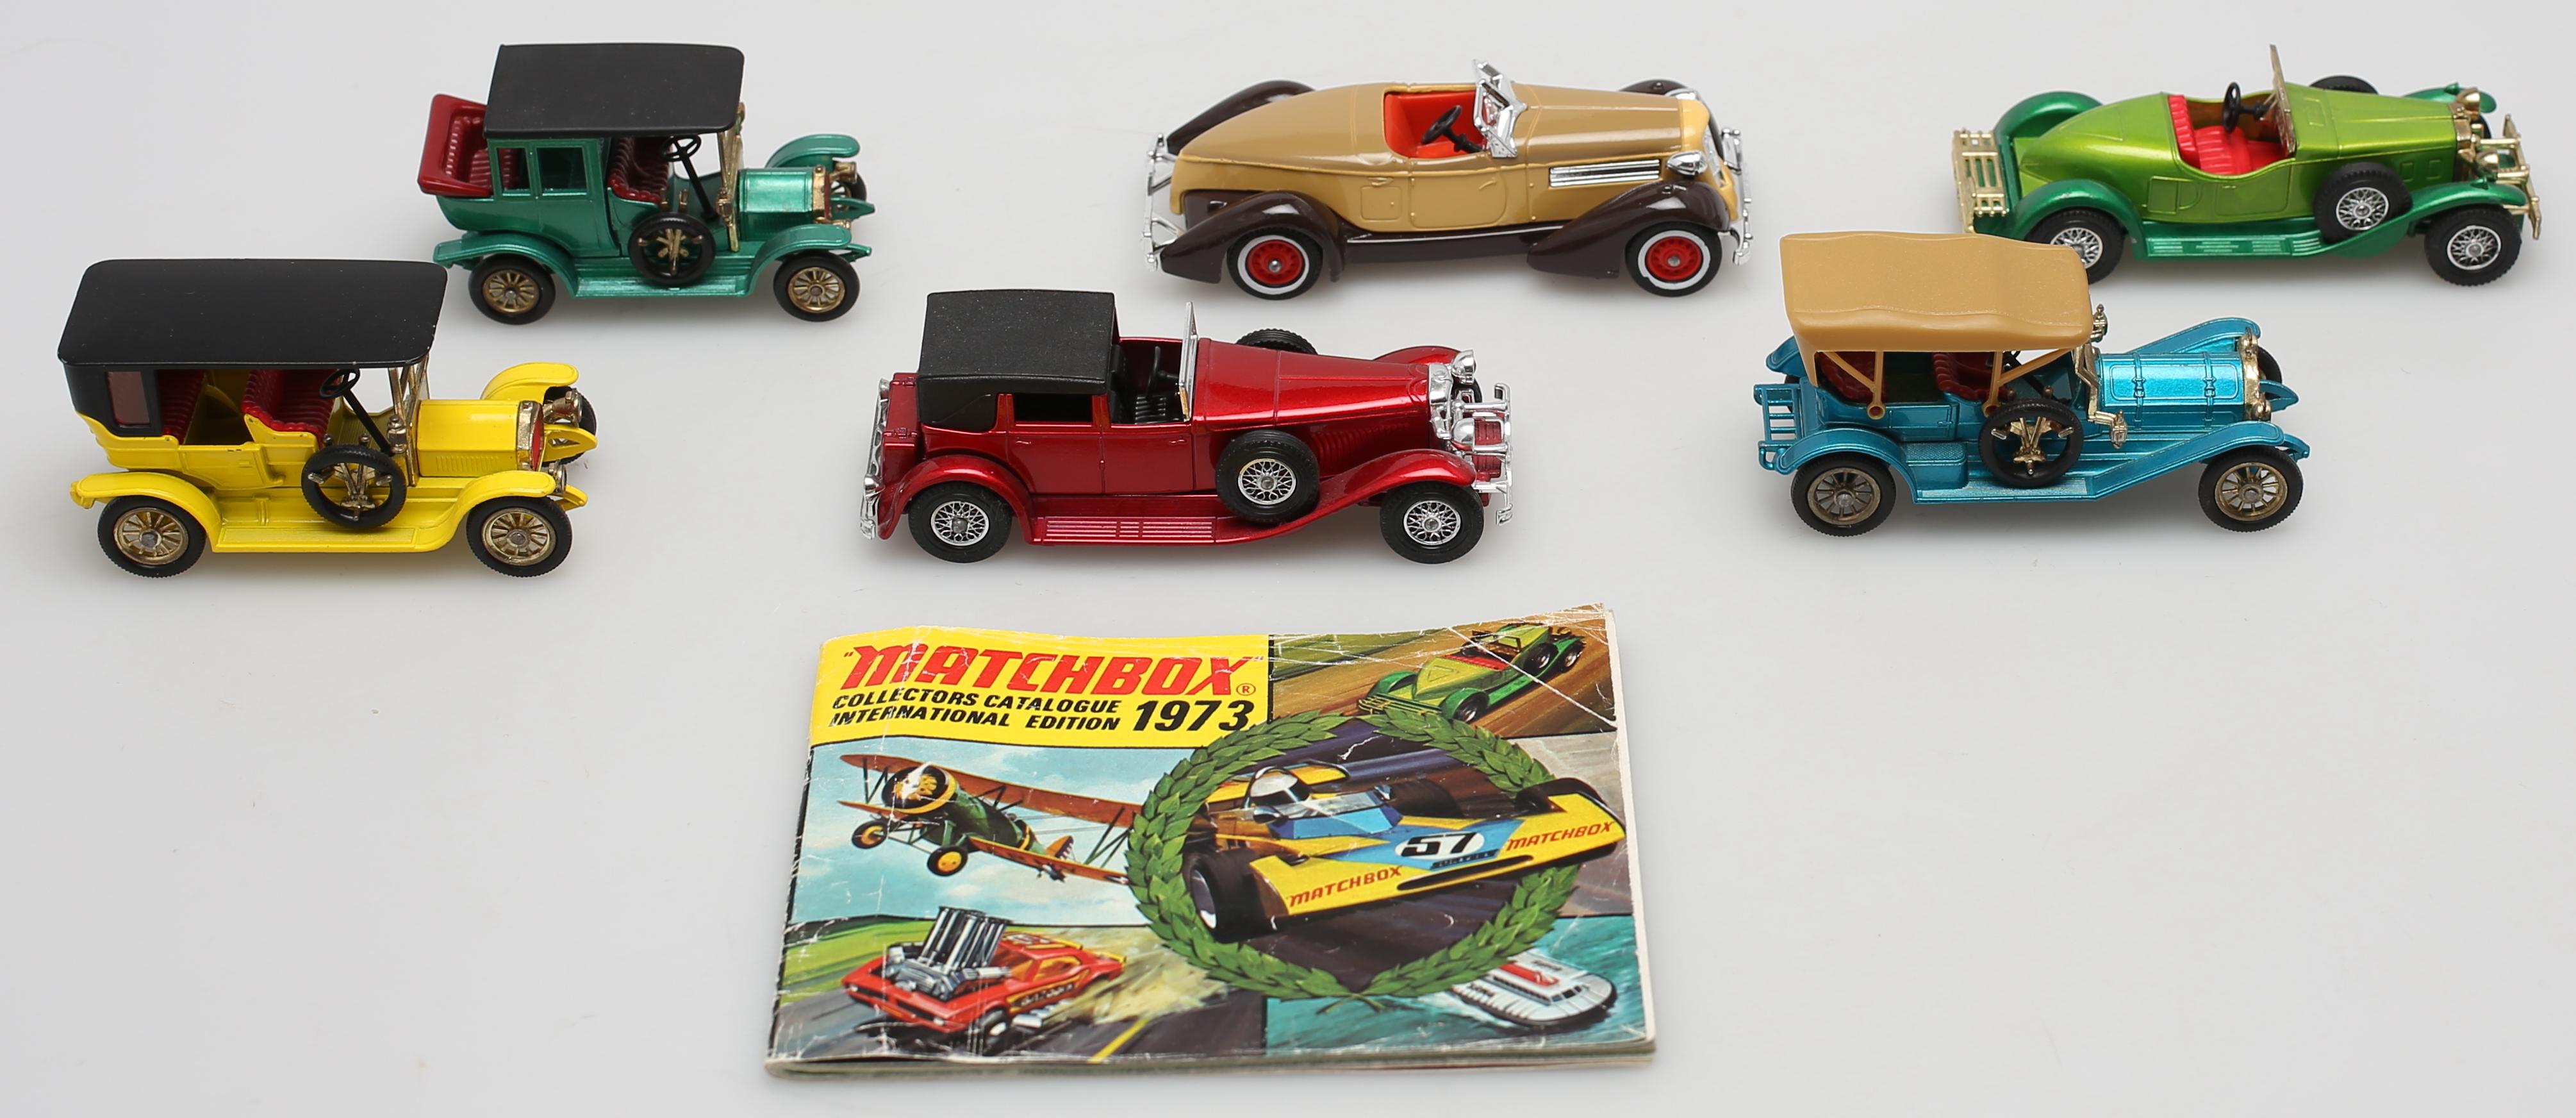 PARTI LEKSAKSBILAR (6)  Bl a Matchbox och Lesney  Toys - Auctionet